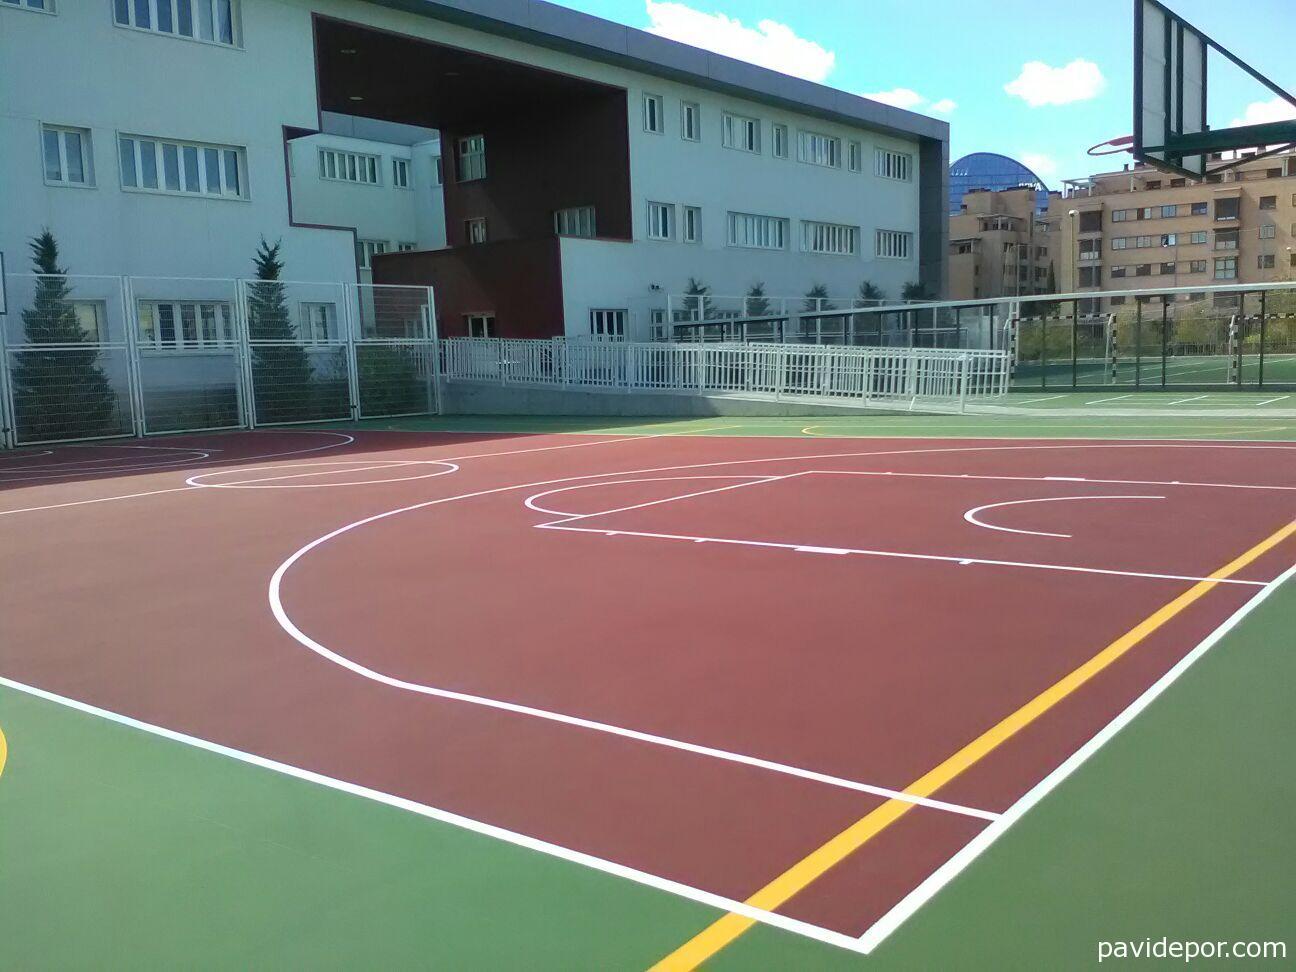 Pavimento deportivo